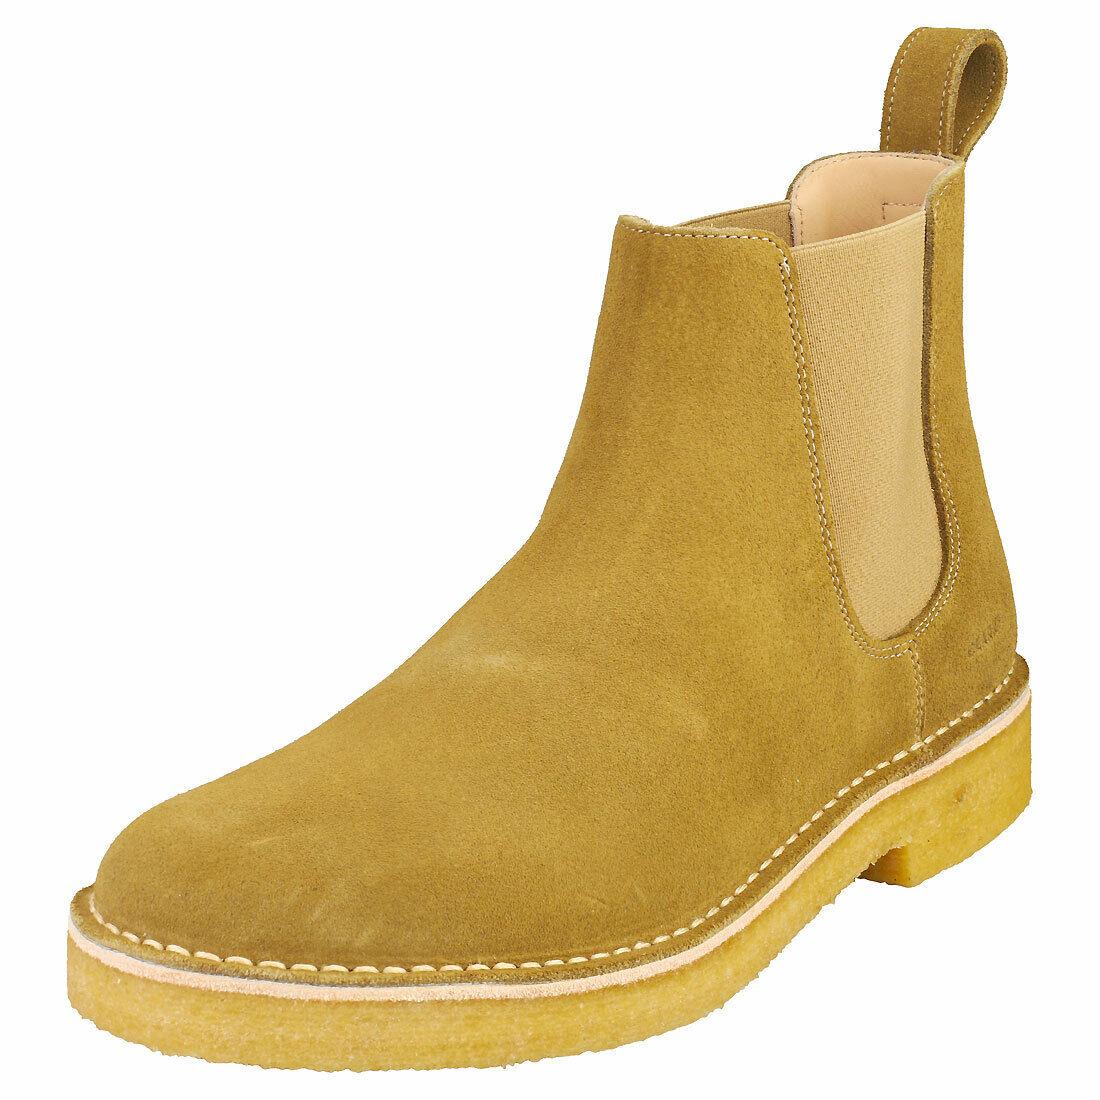 Clarks Originals Desert Chelsea2 Mens Olive Suede Chelsea Boots